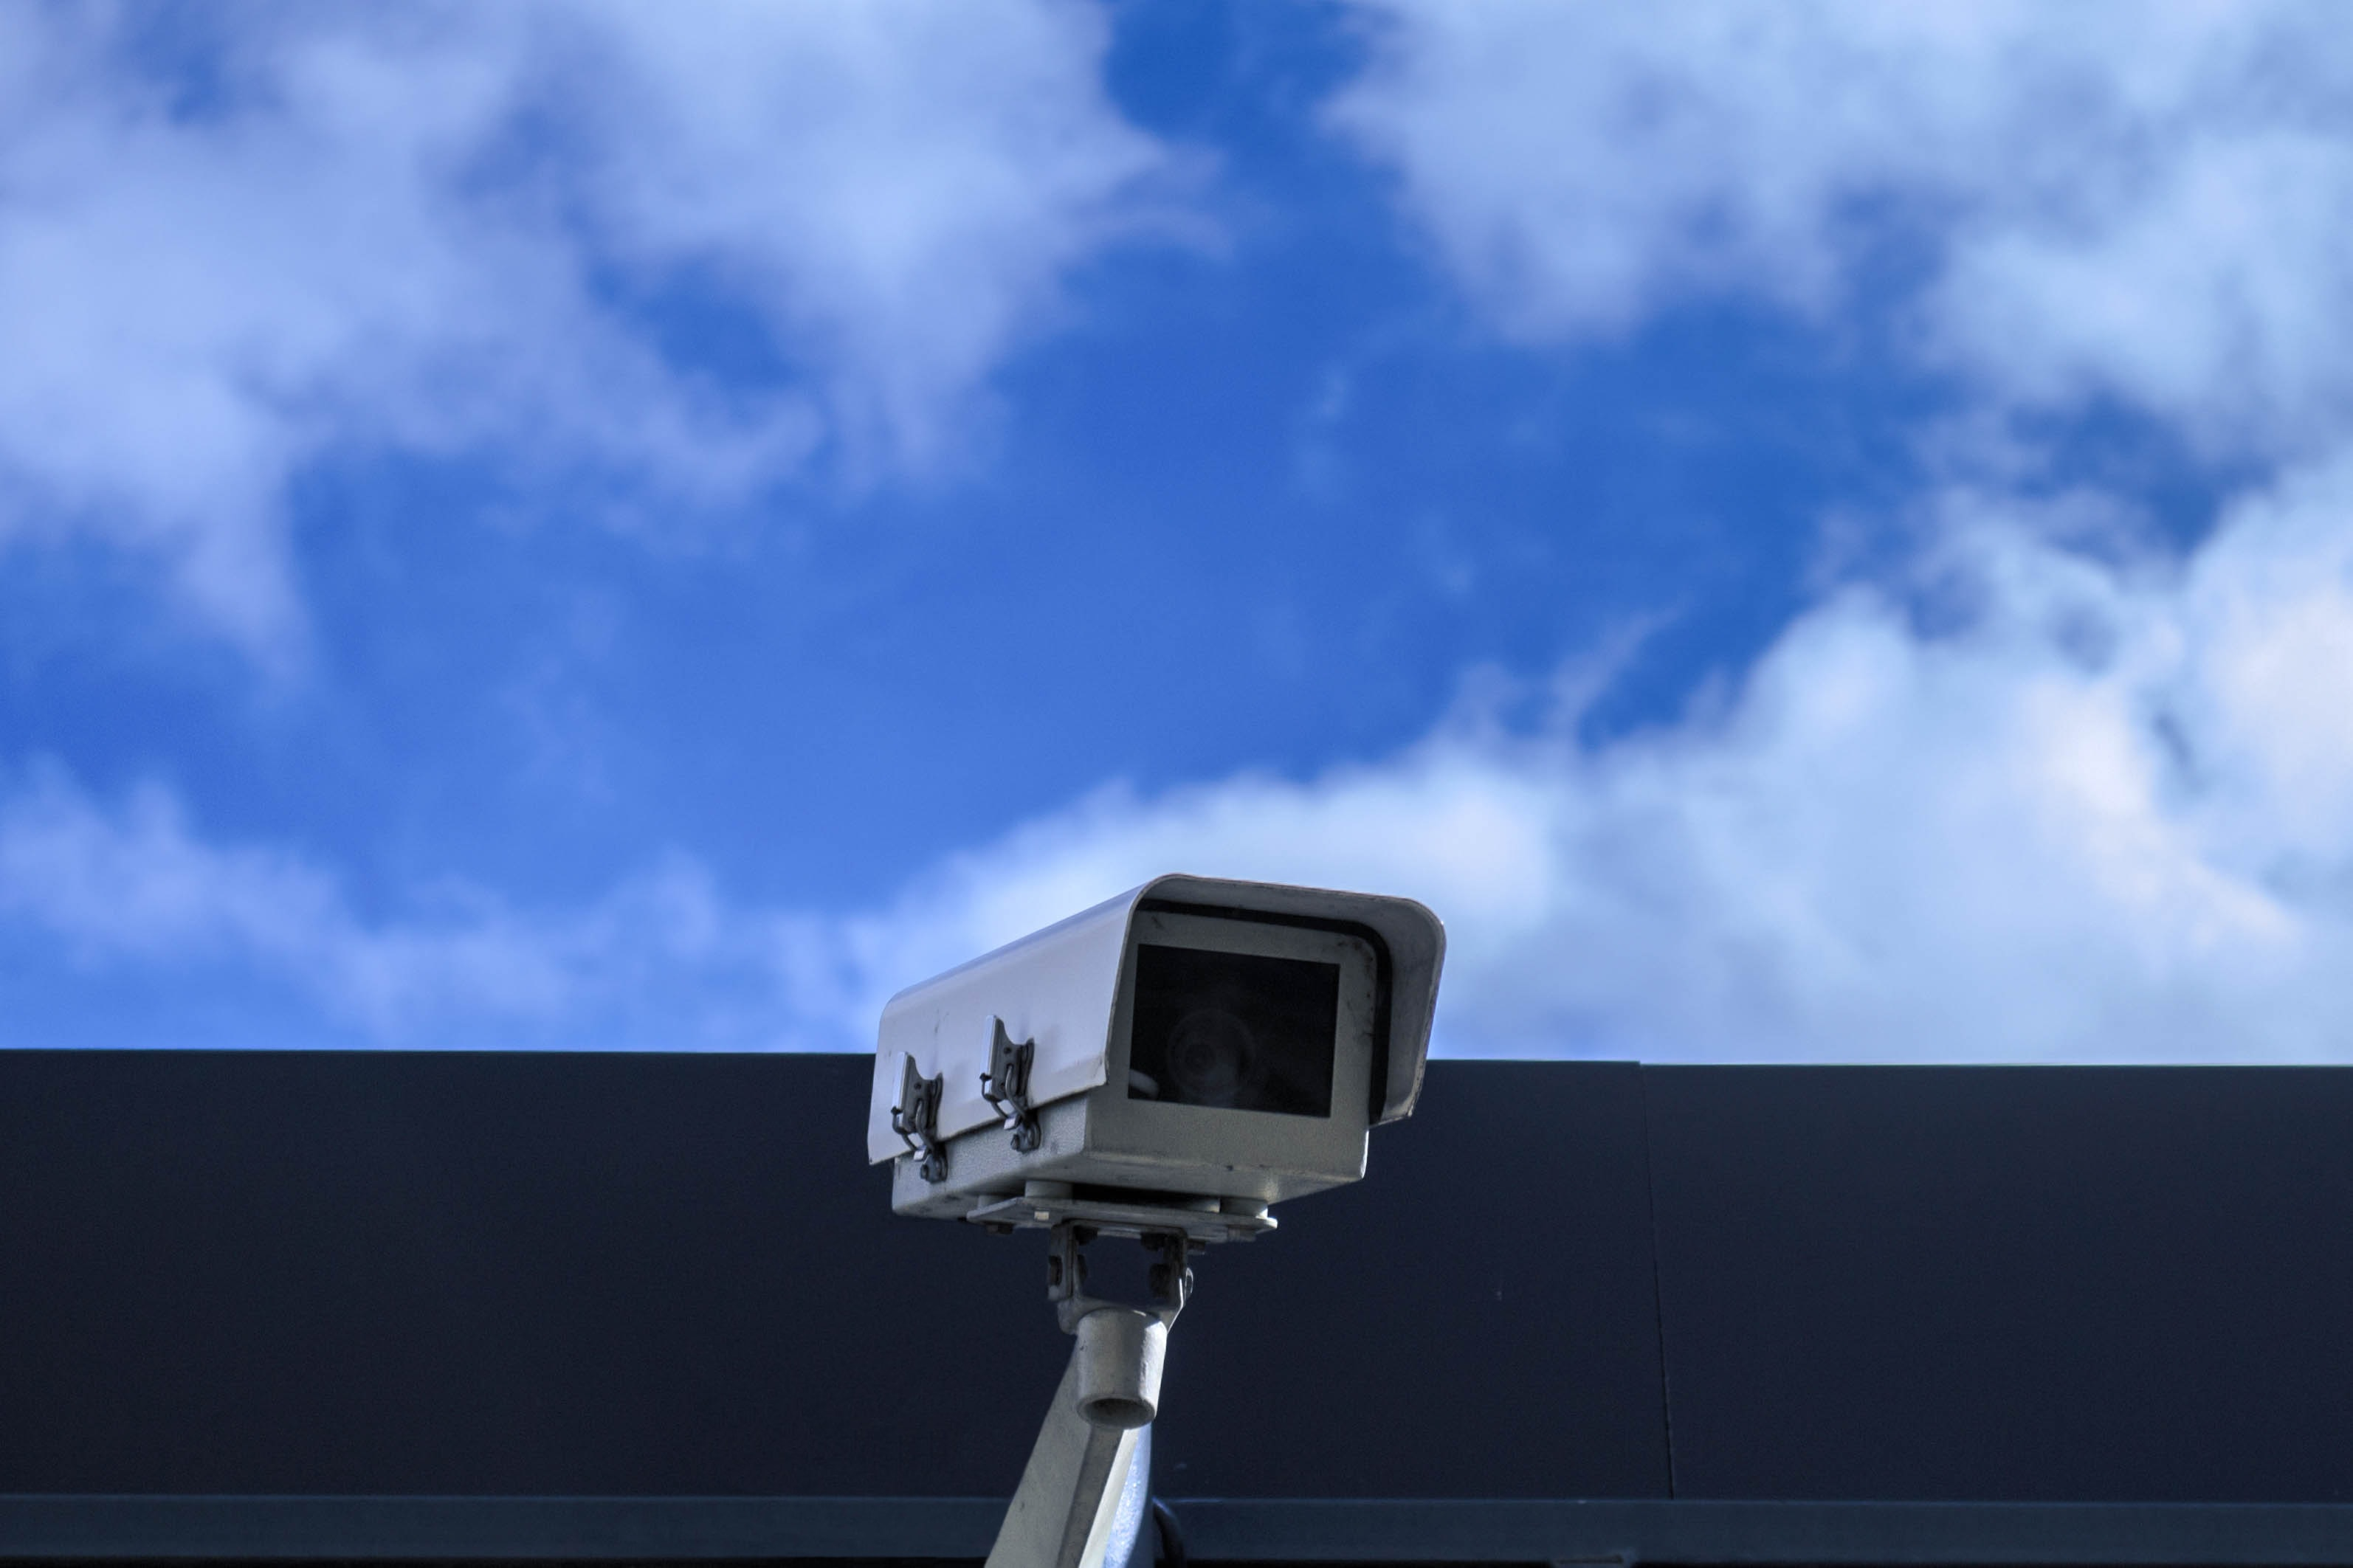 exterior security camera